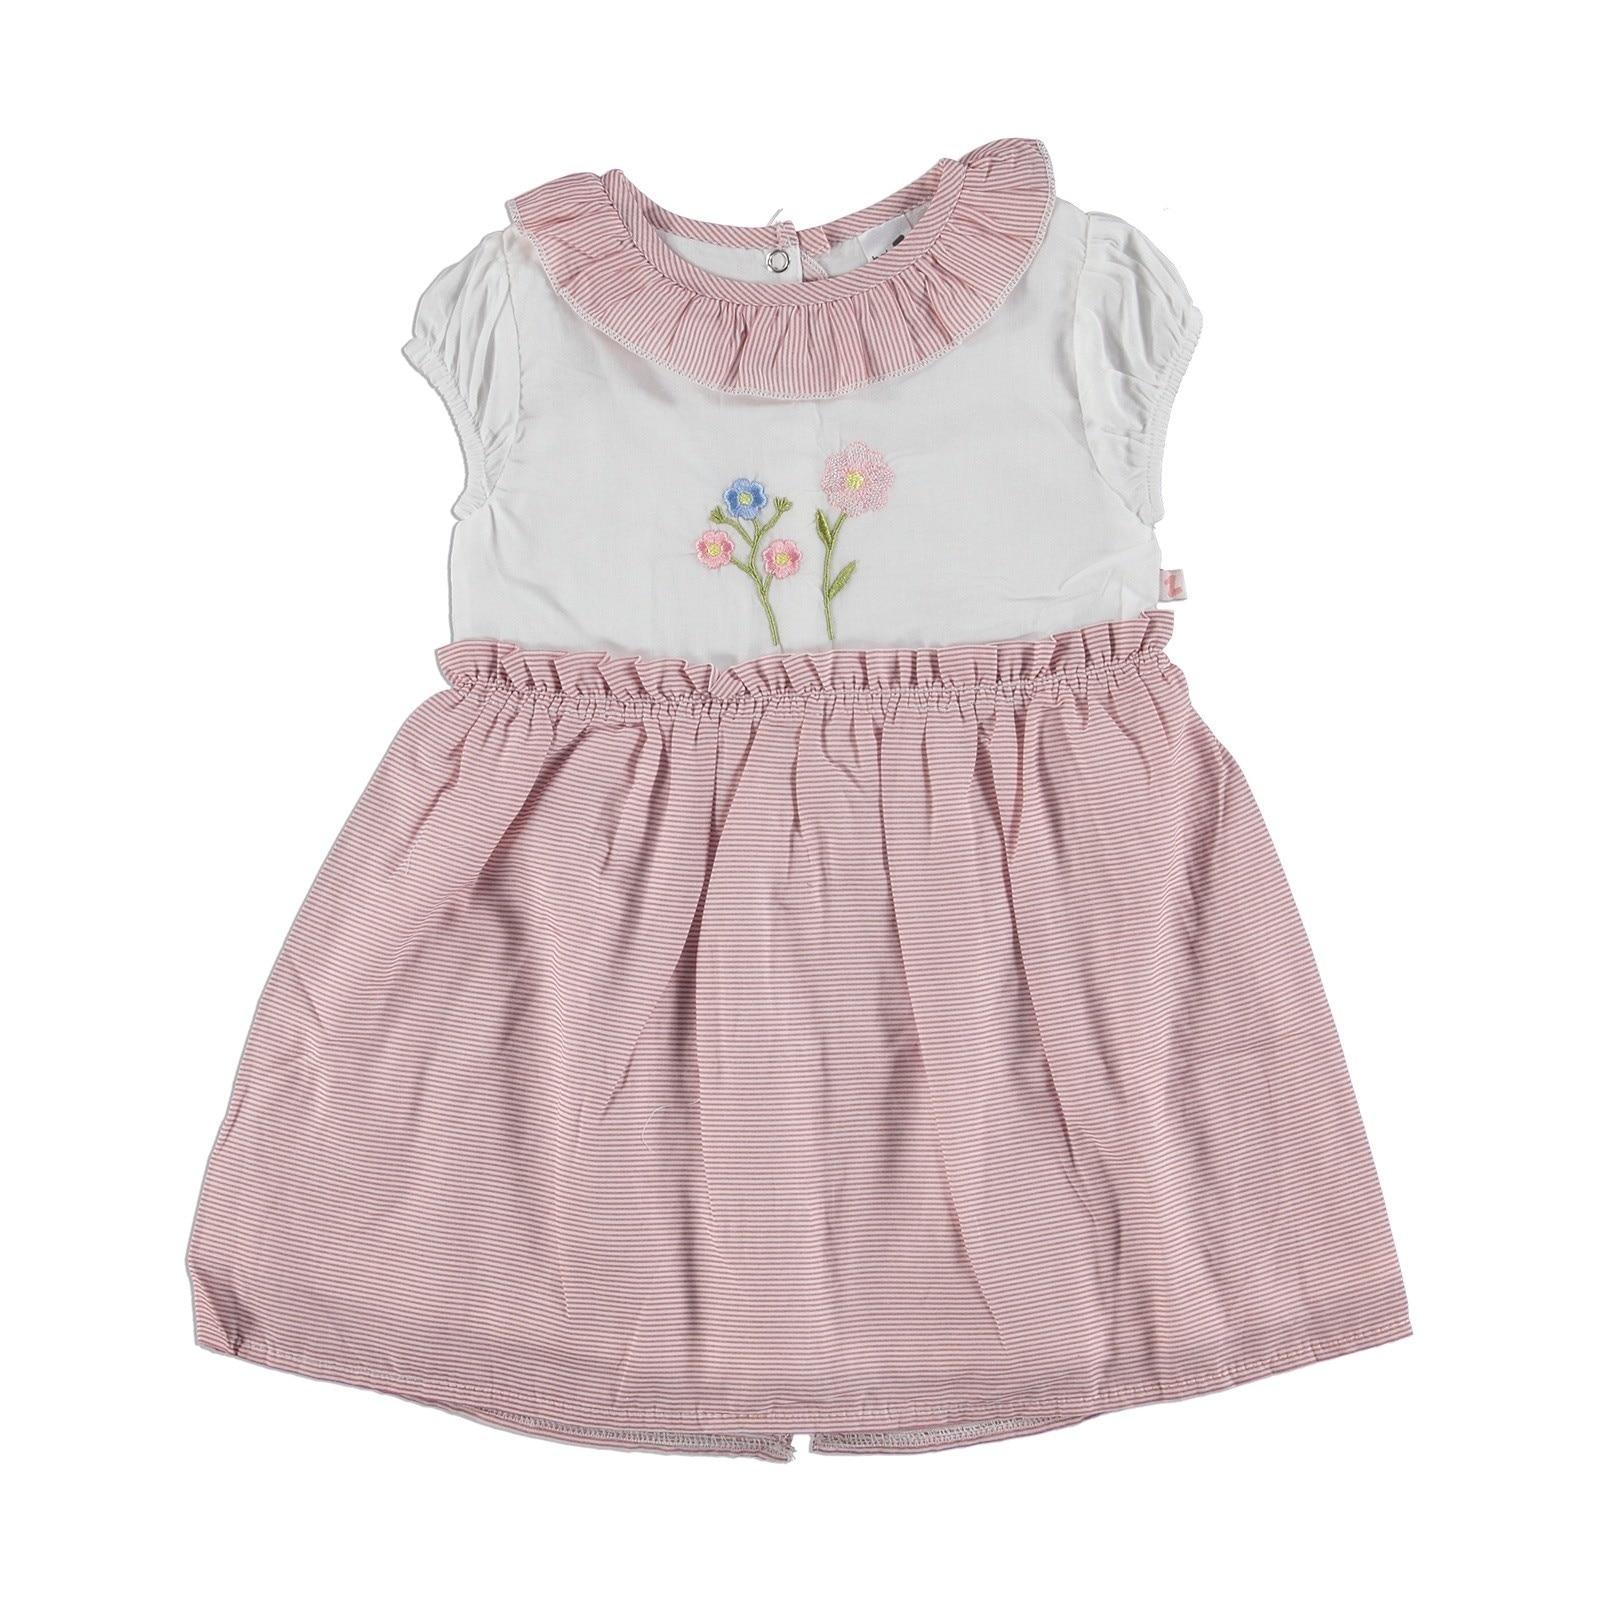 Ebebek BabyZ Flower Embroidered Baby Girl Dress